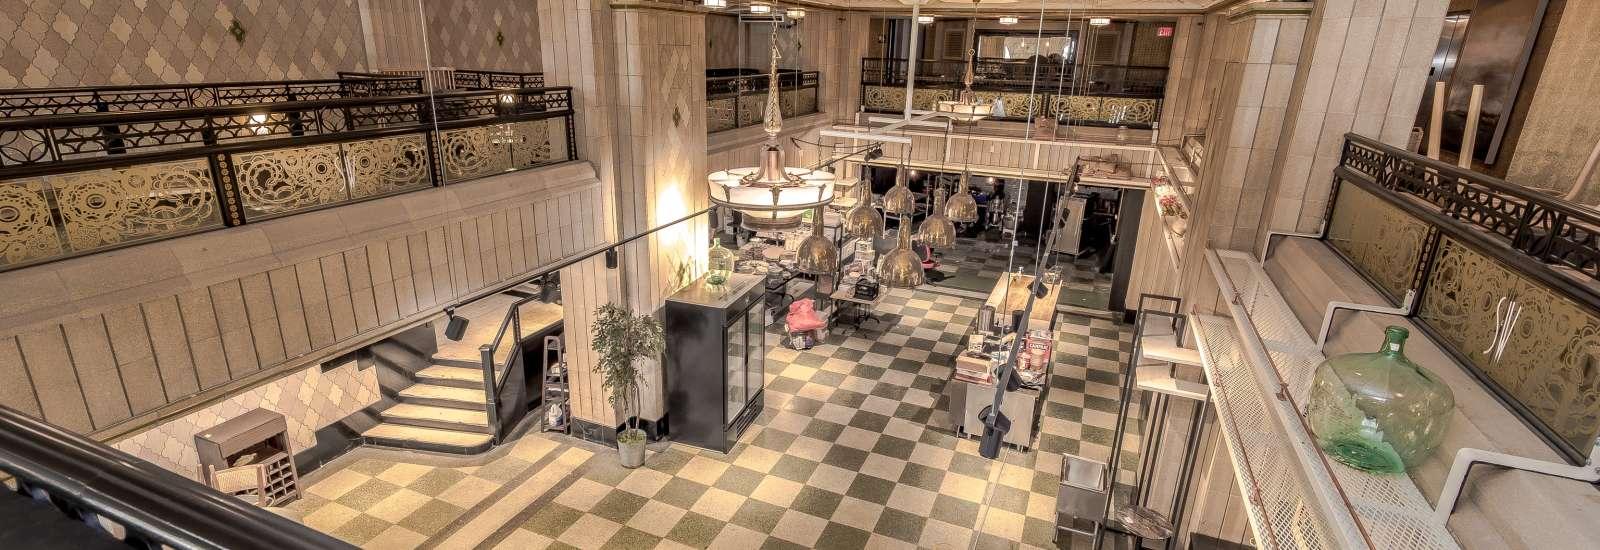 S&W Building Interior